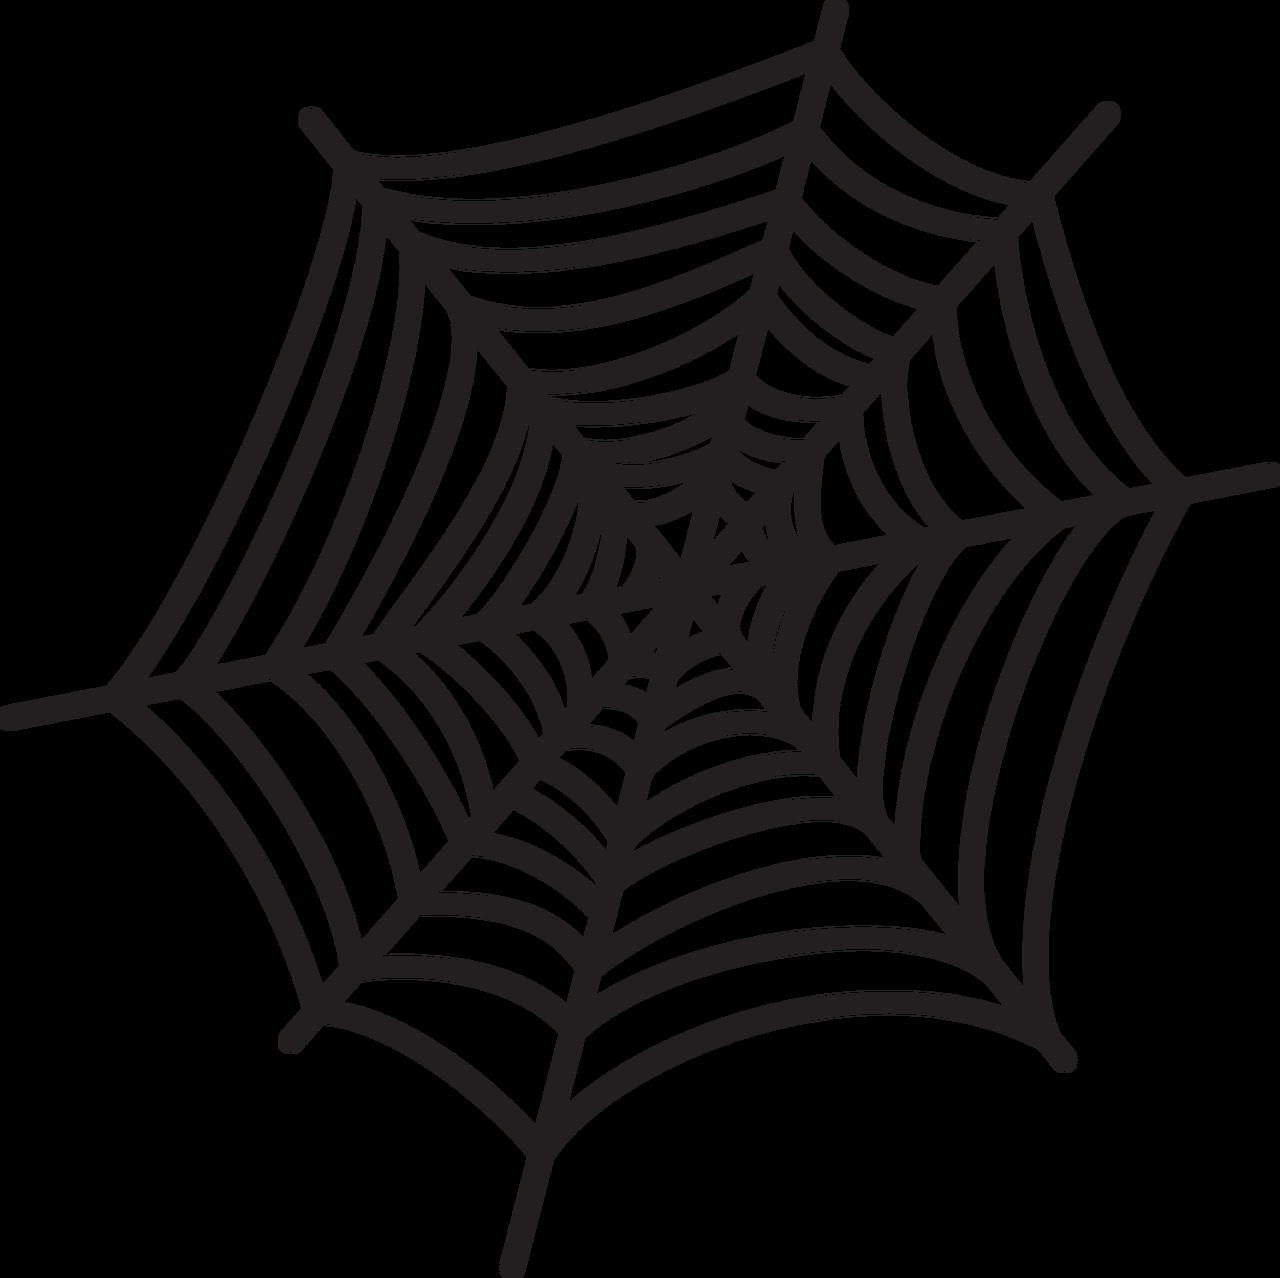 Spider Web SVG Cut File